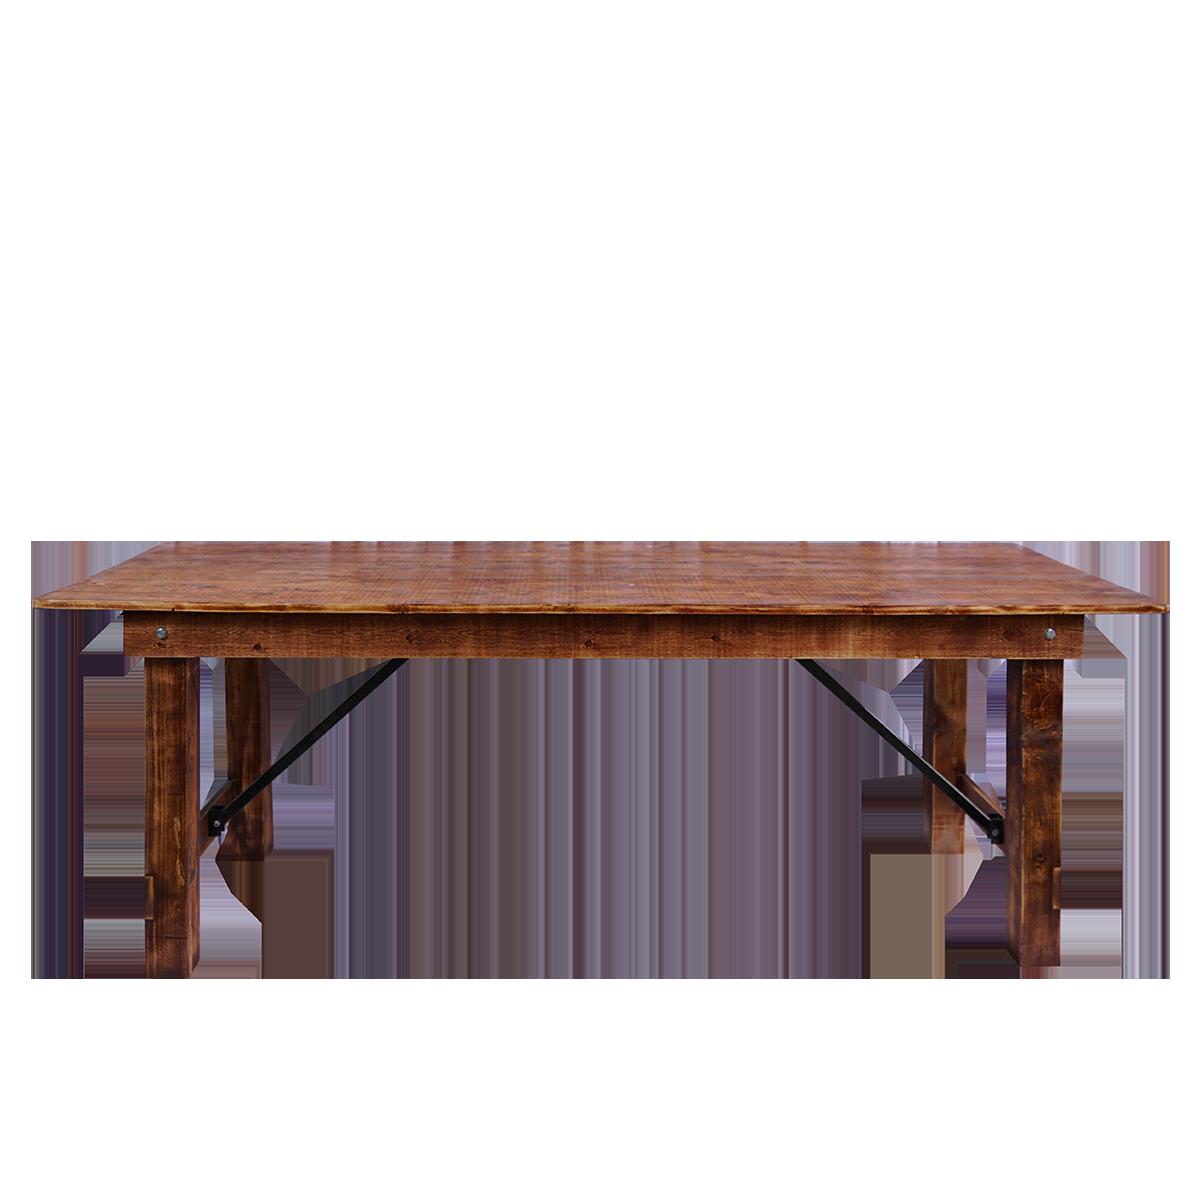 "Farmhouse Edition Tisch, Echtholz ""Old Oak"", 220 x 80 x 80 cm"